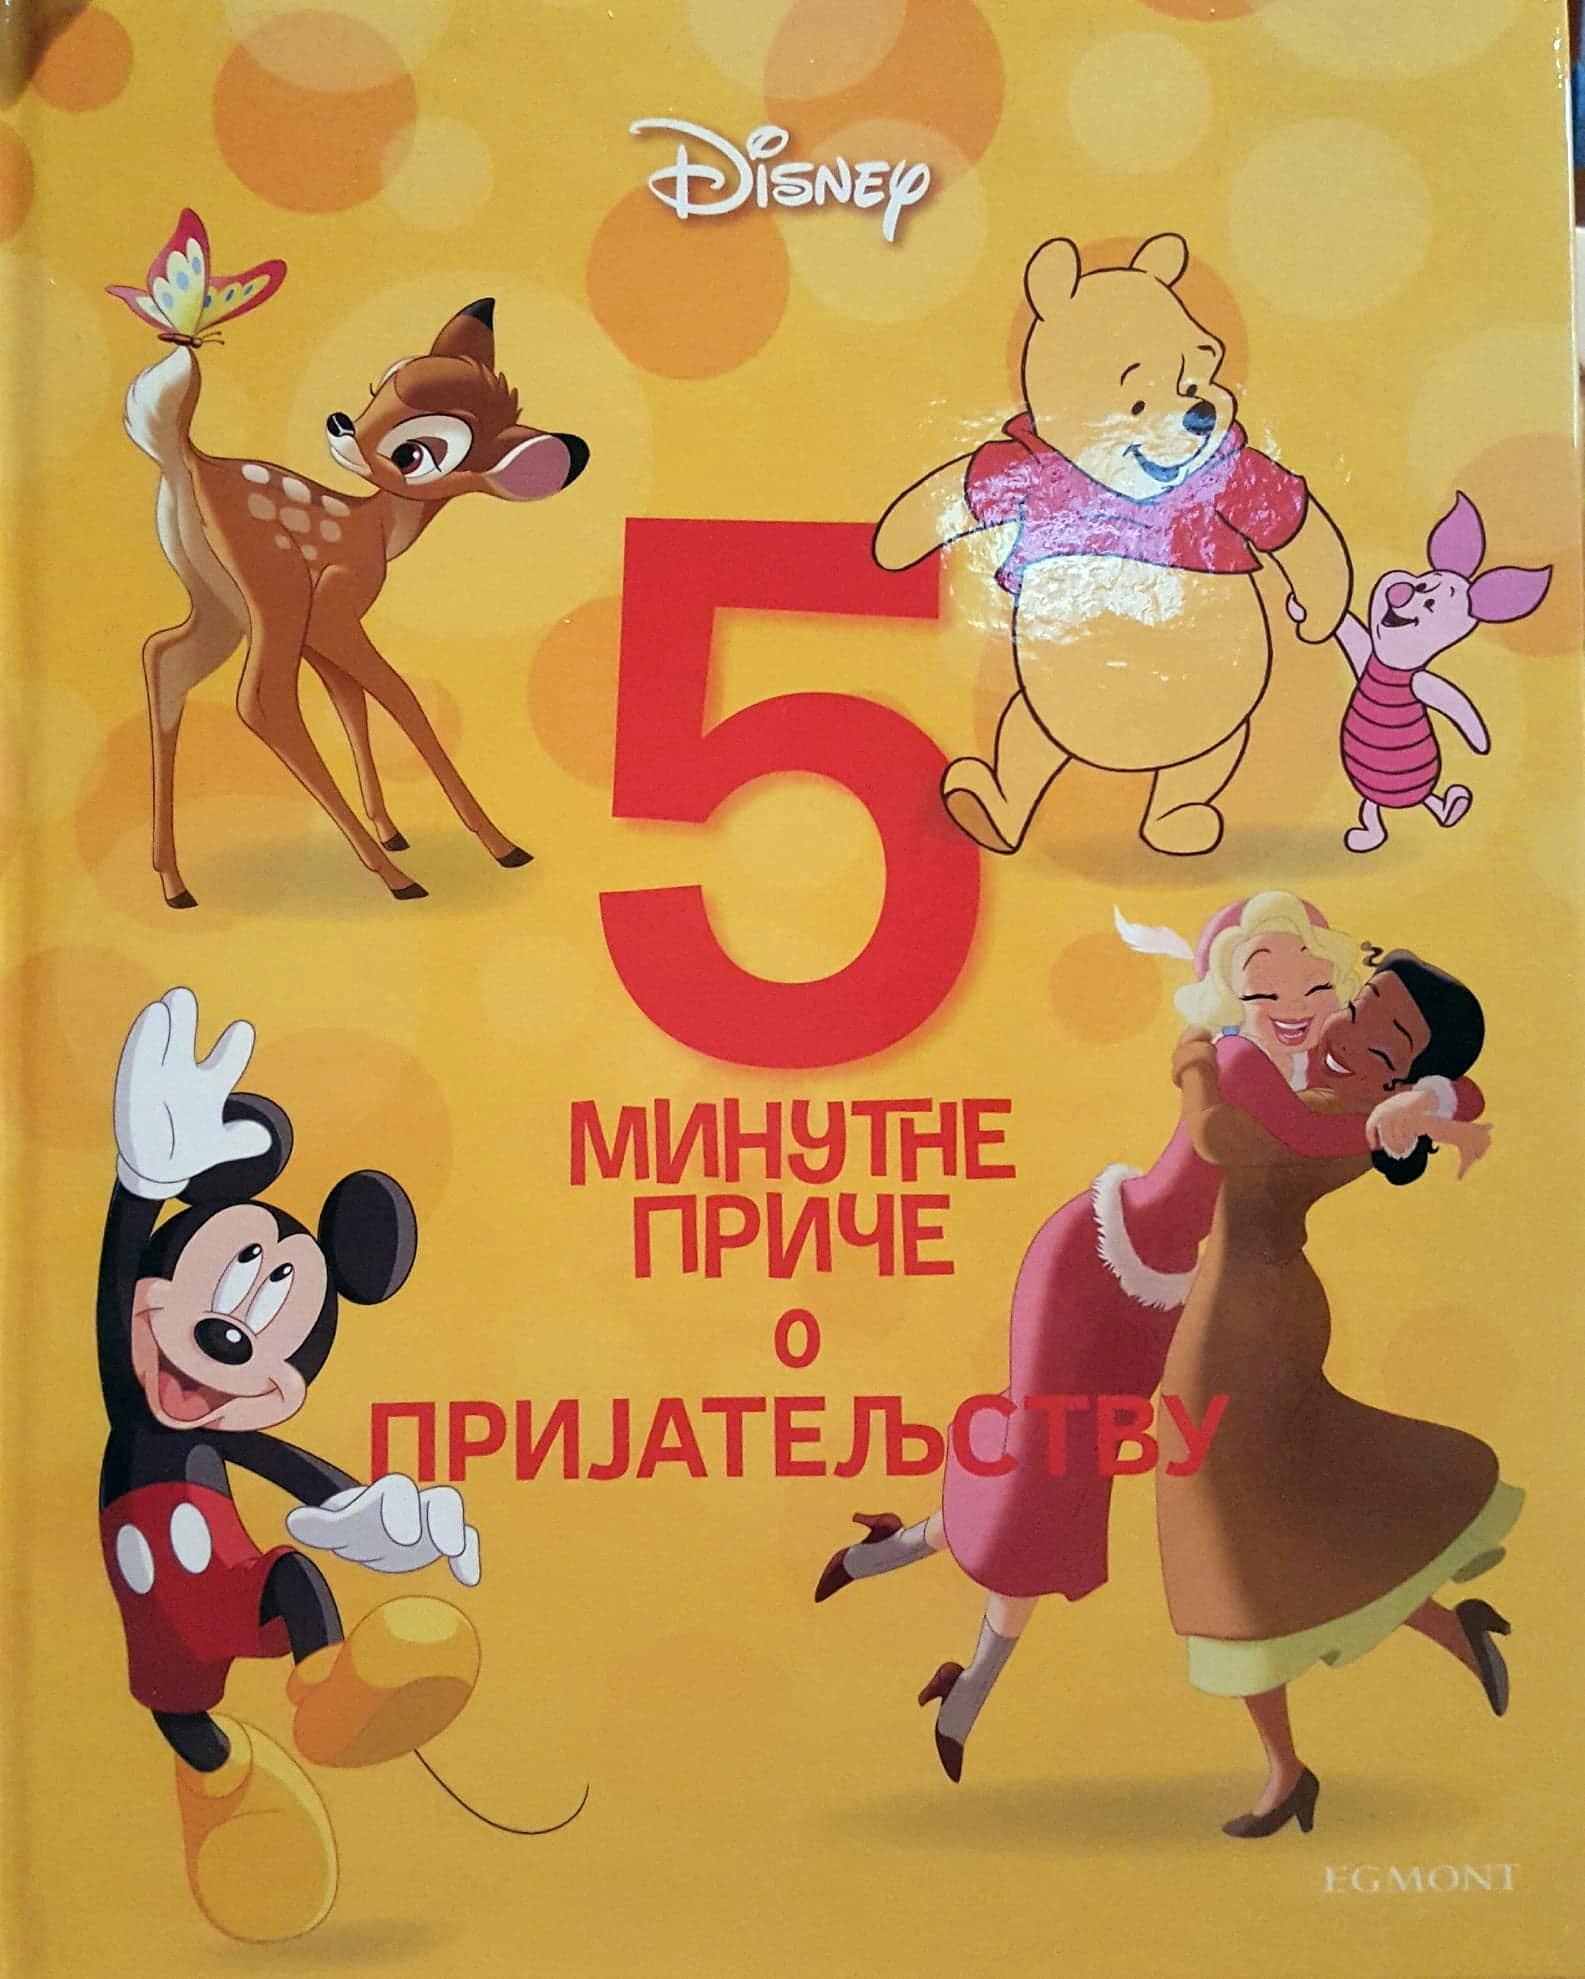 Petominutne priče o prijateljstvu - Disney